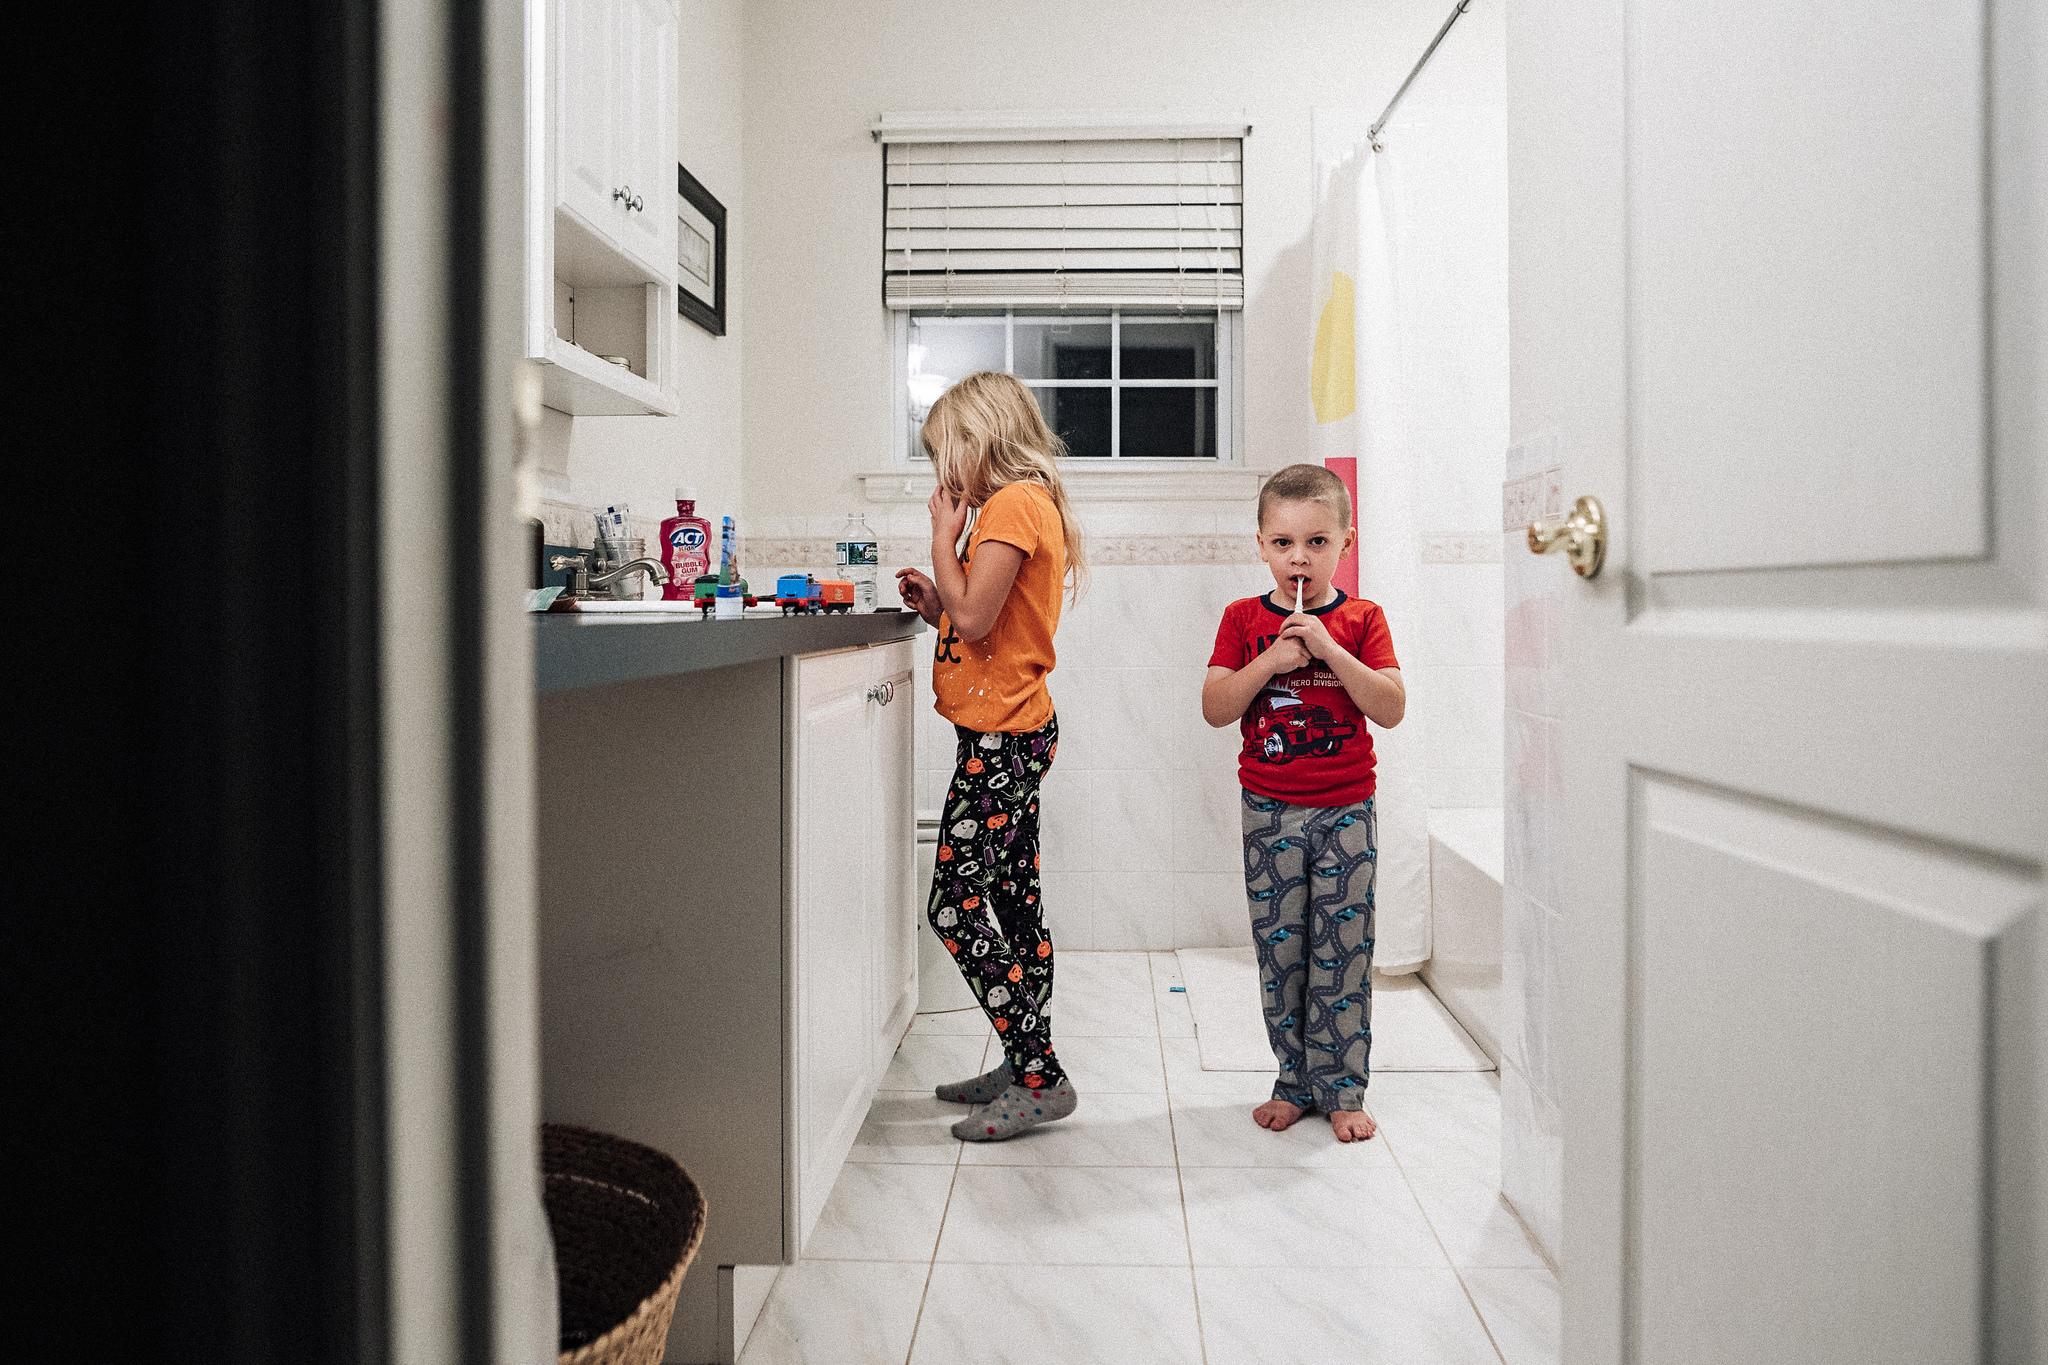 hello-olivia-photography-family-photojournalism-365-tutorial-documenting-bedtime-rituals-lowlight-kids-documentary-and lifestyle-photographer-long-island-new-york9.jpg